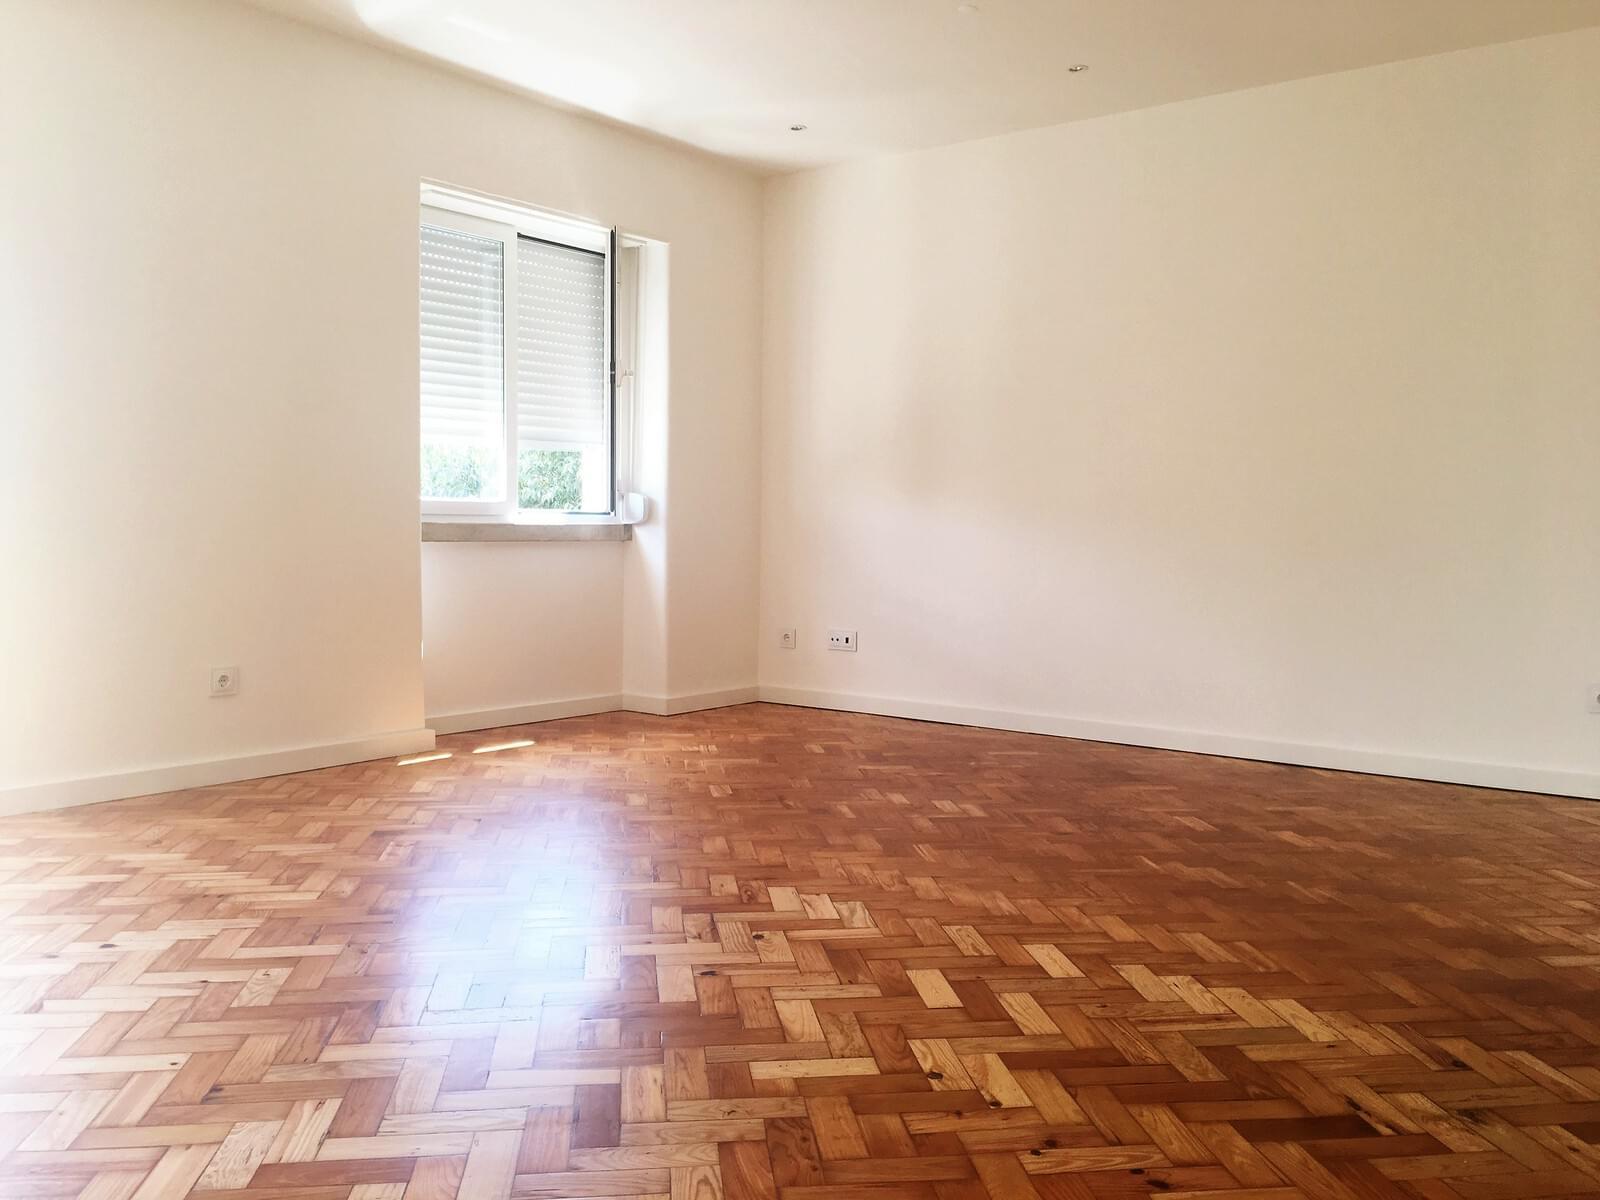 pf17642-apartamento-t3-lisboa-6f7a84a2-3b96-4cac-9a5a-4562e57eefe5